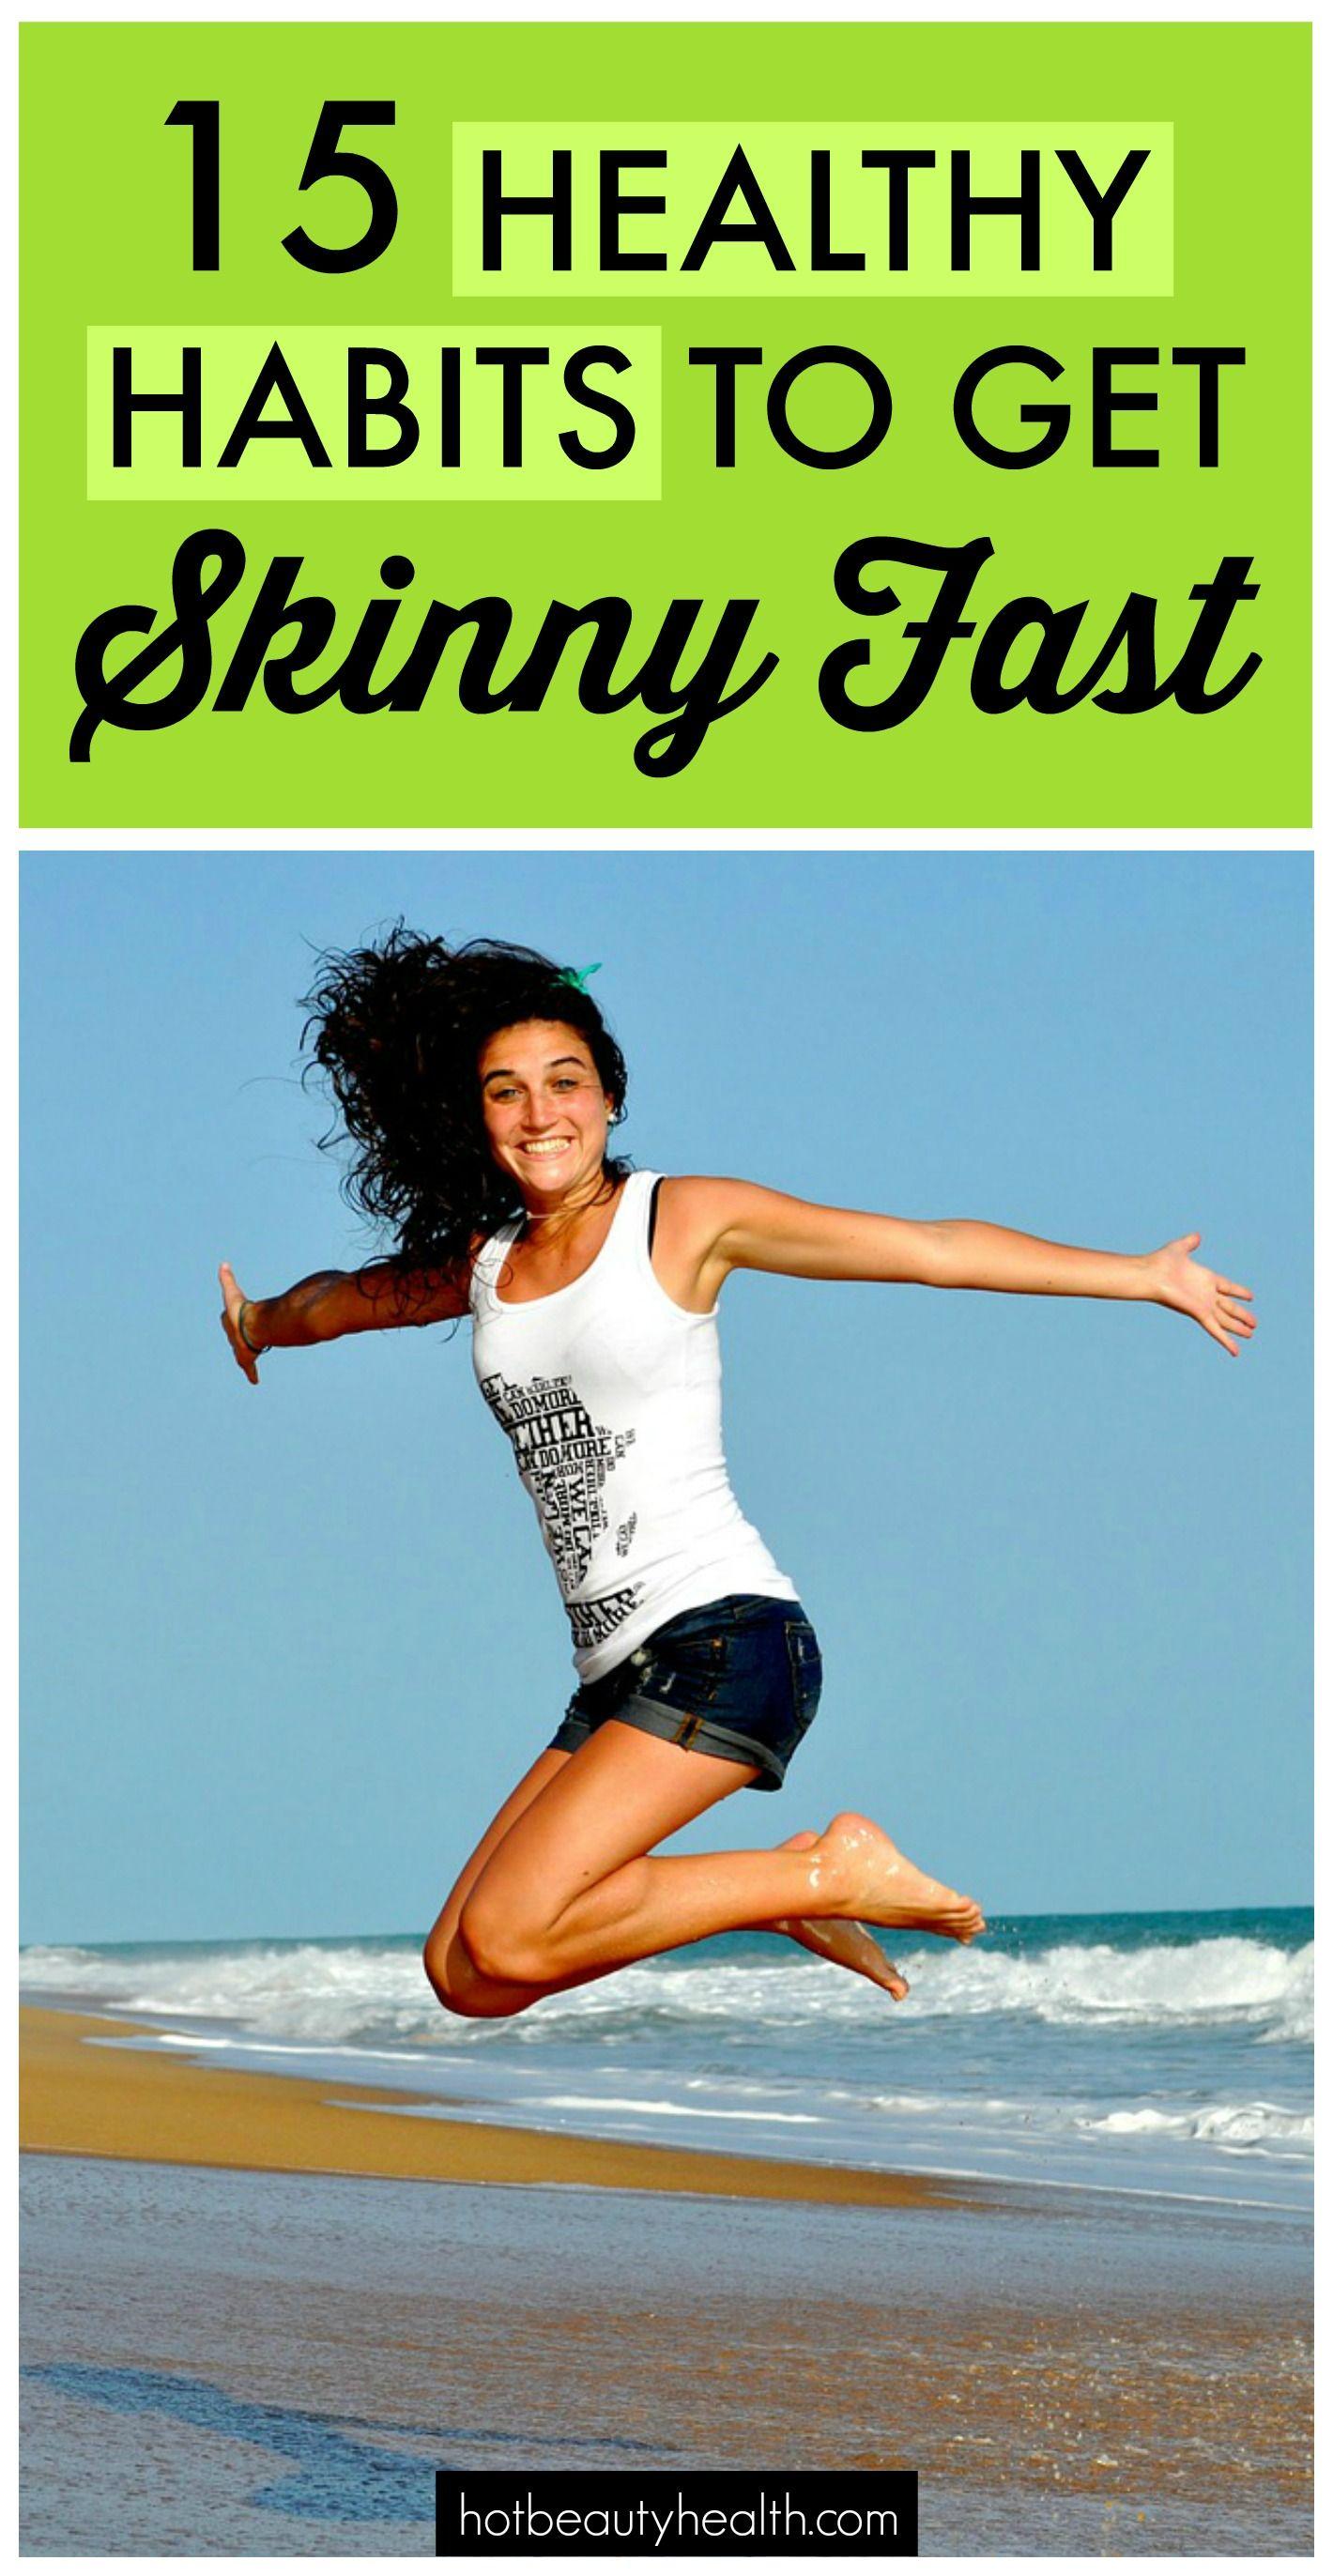 Bizarre Weight Loss Tricks That Work | Reader's Digest